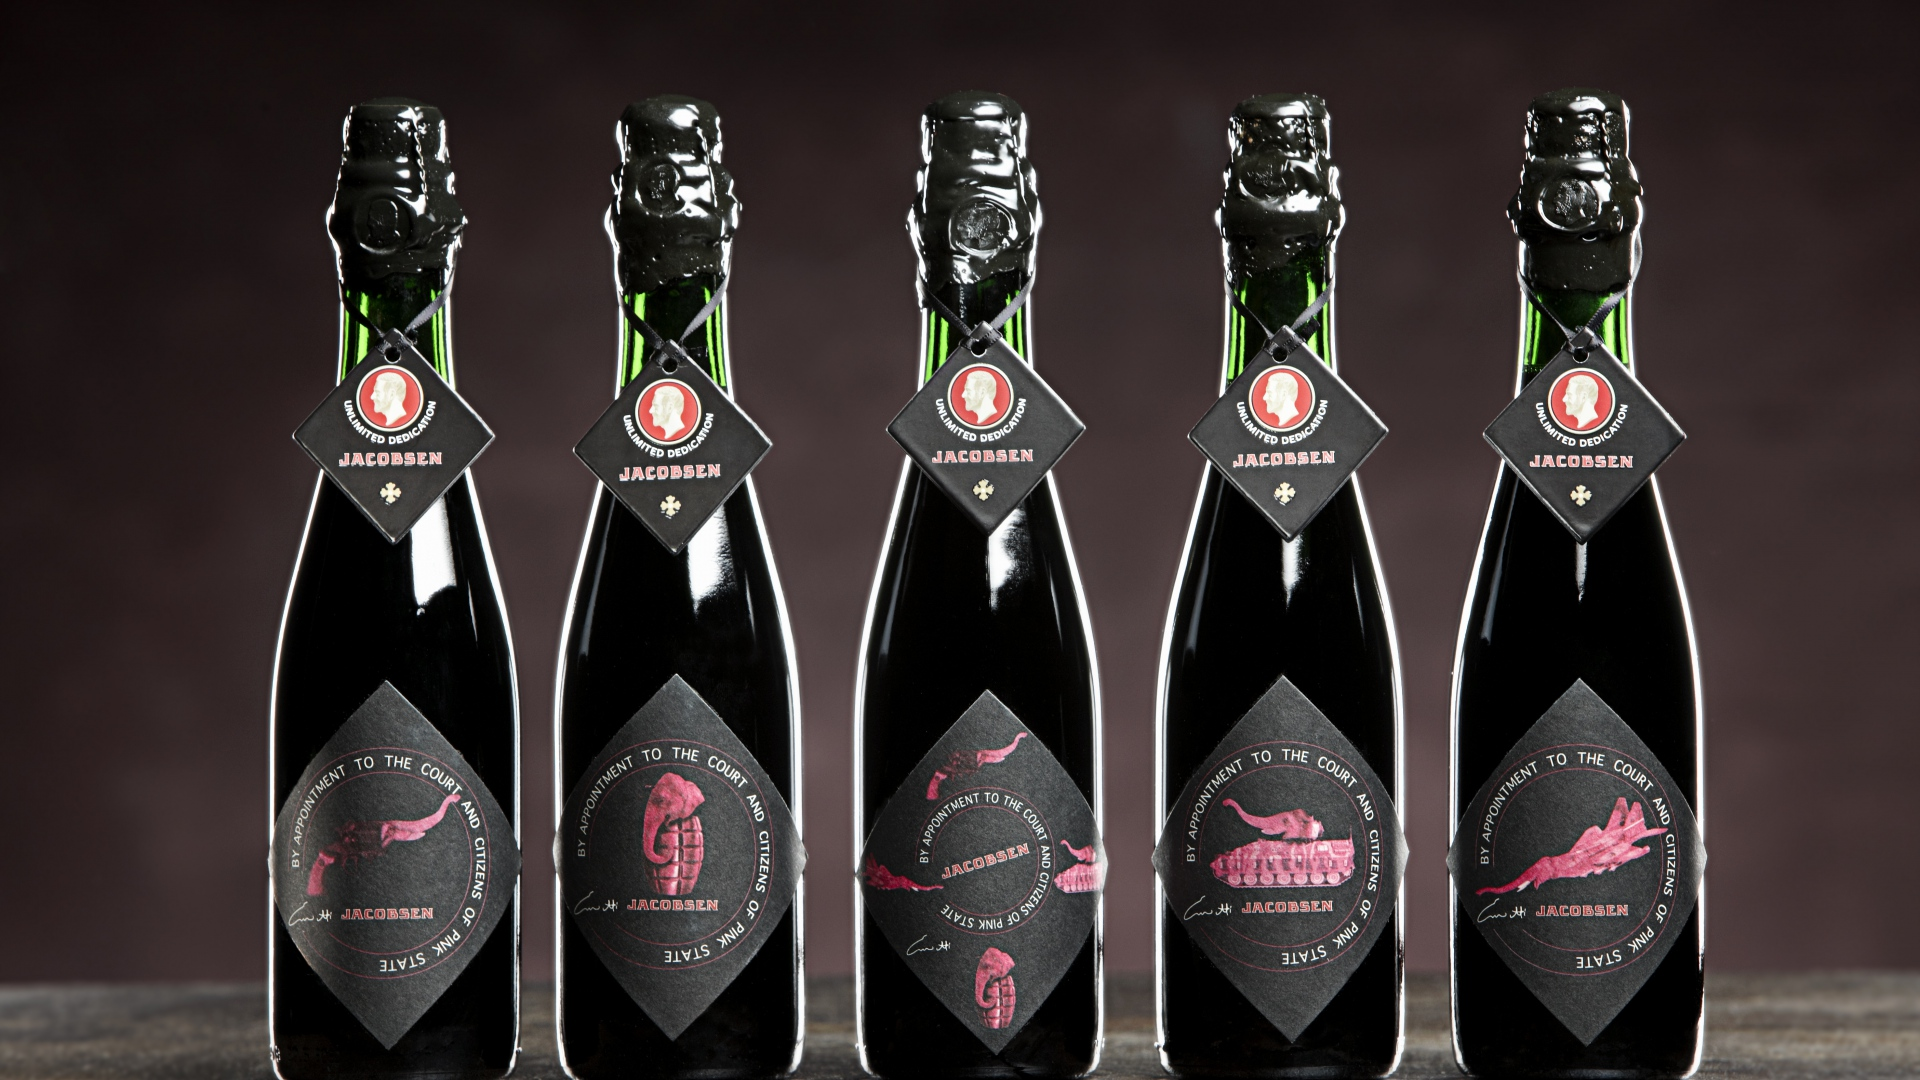 hd hintergrundbilder carlsberg bier alkohol teuer vintage 1920x1080